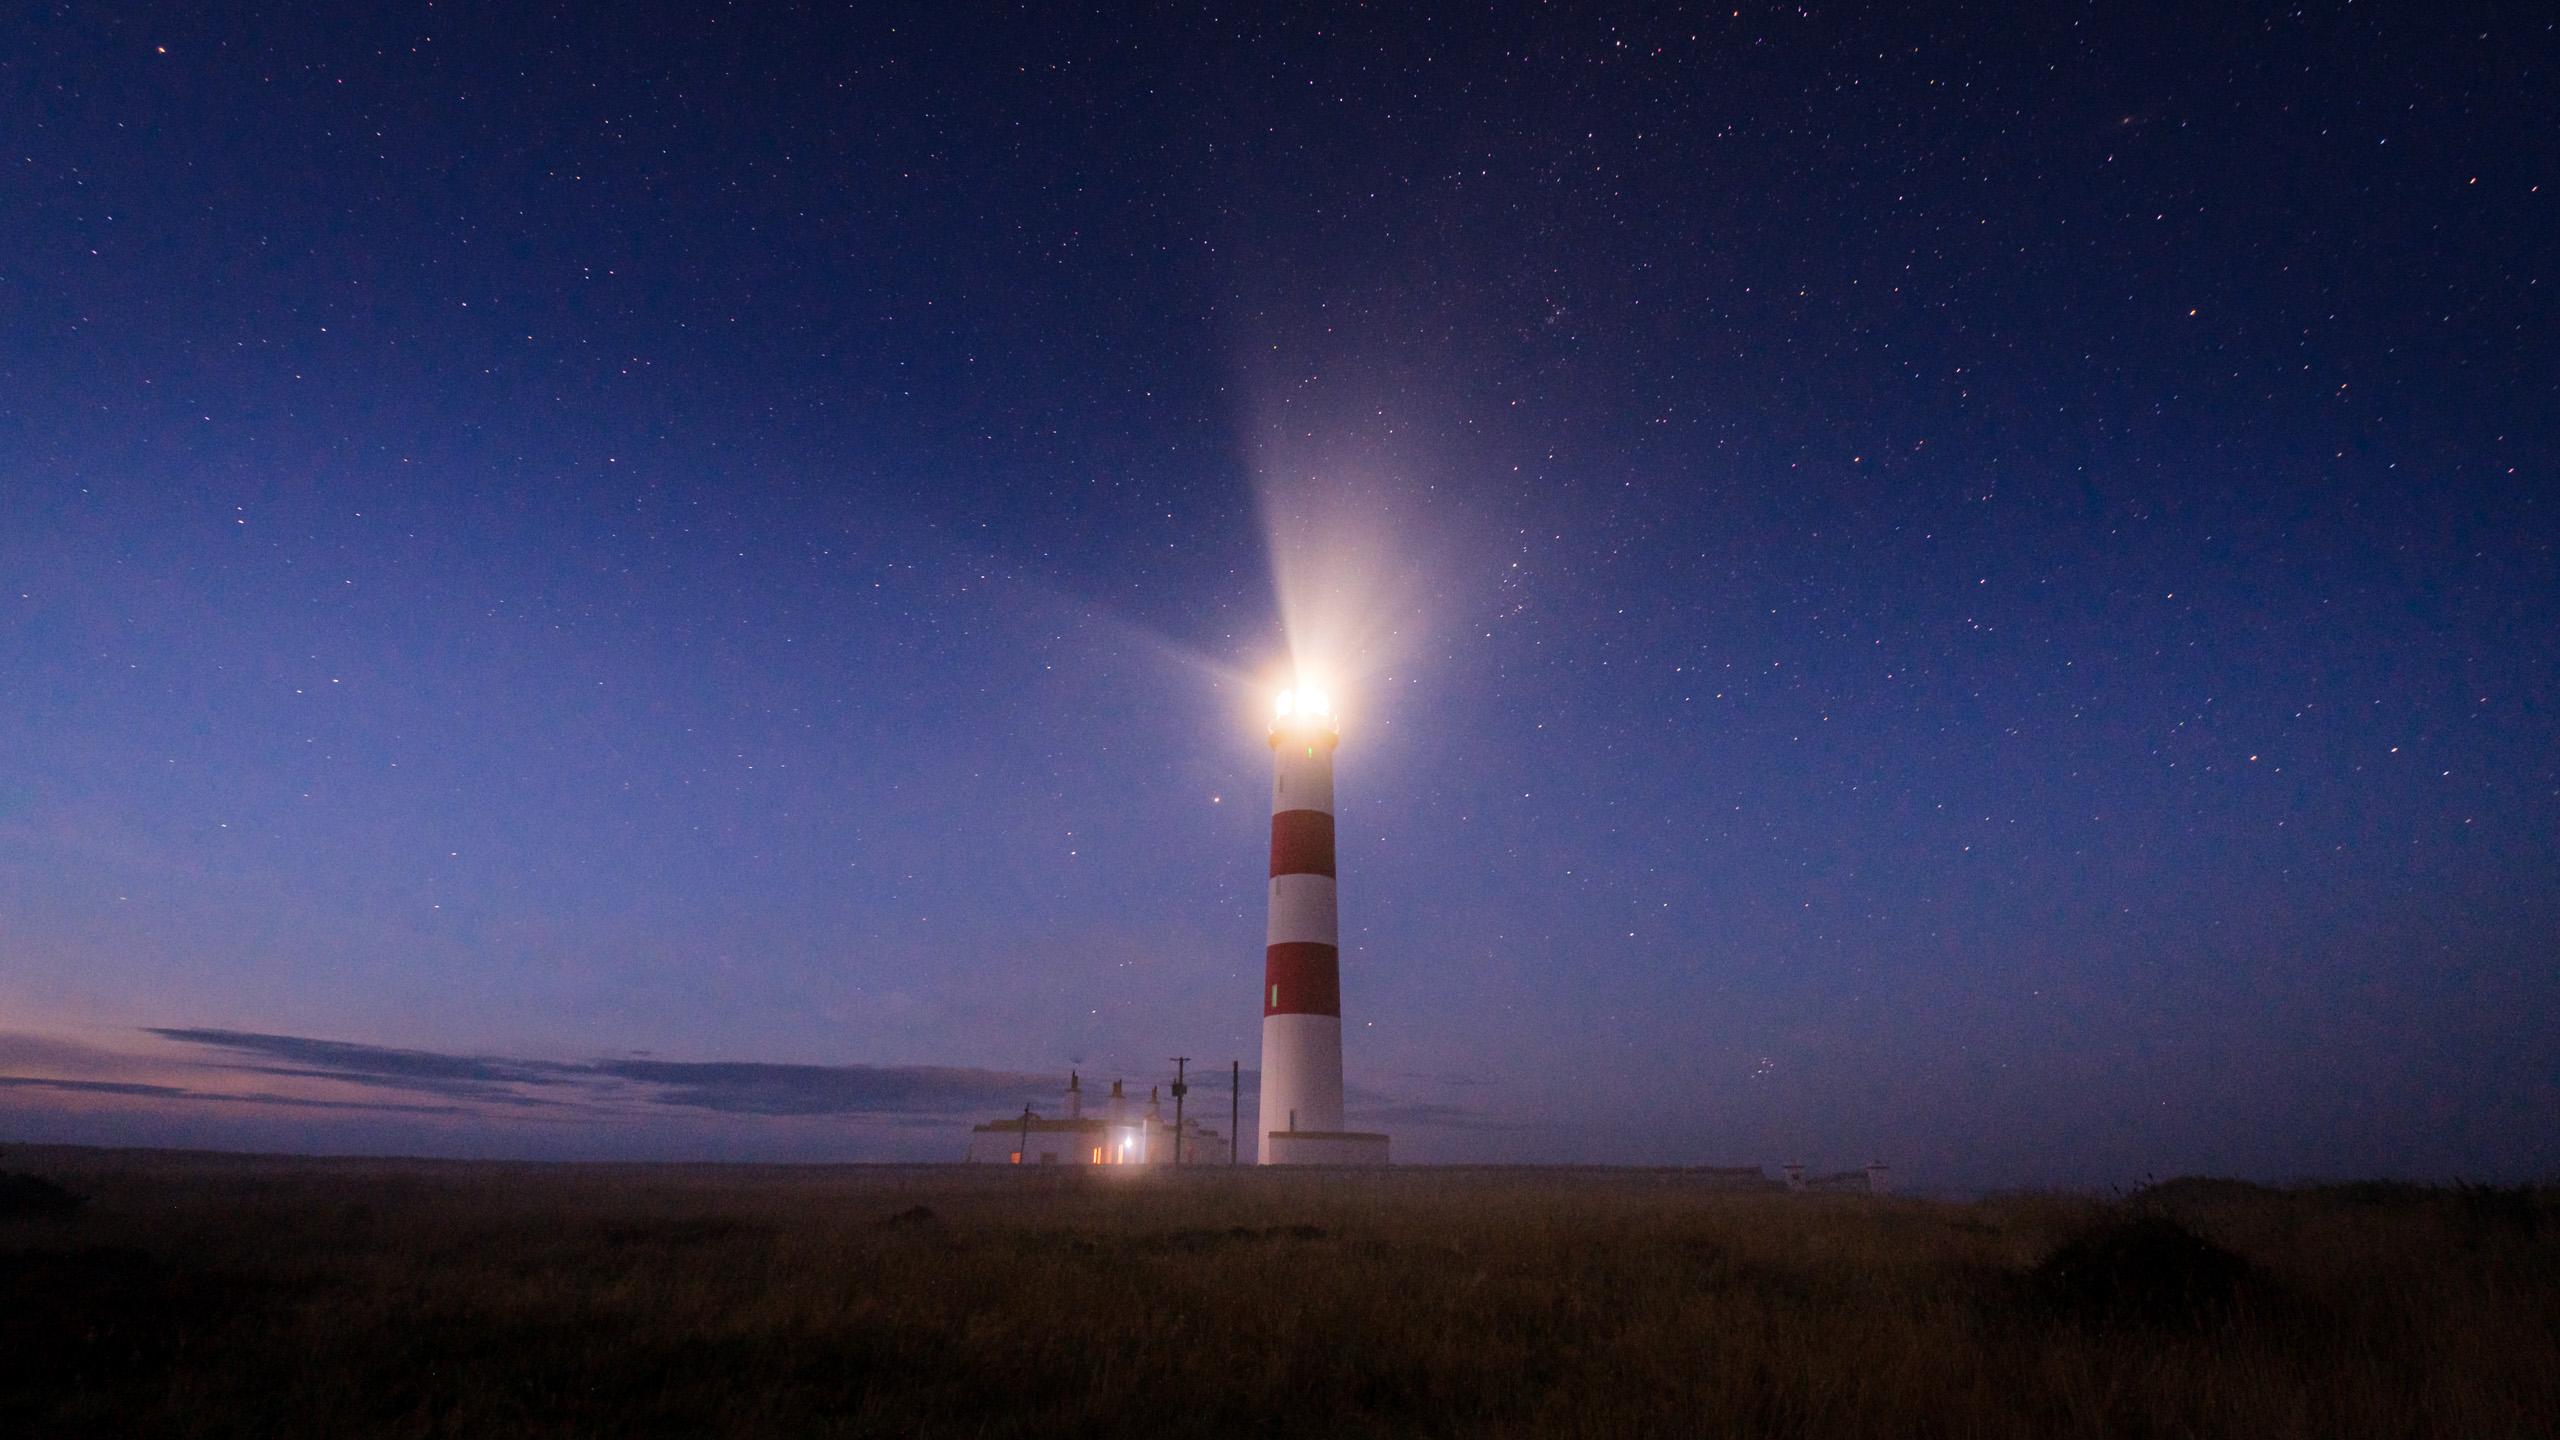 Tarbat Ness lighthouse